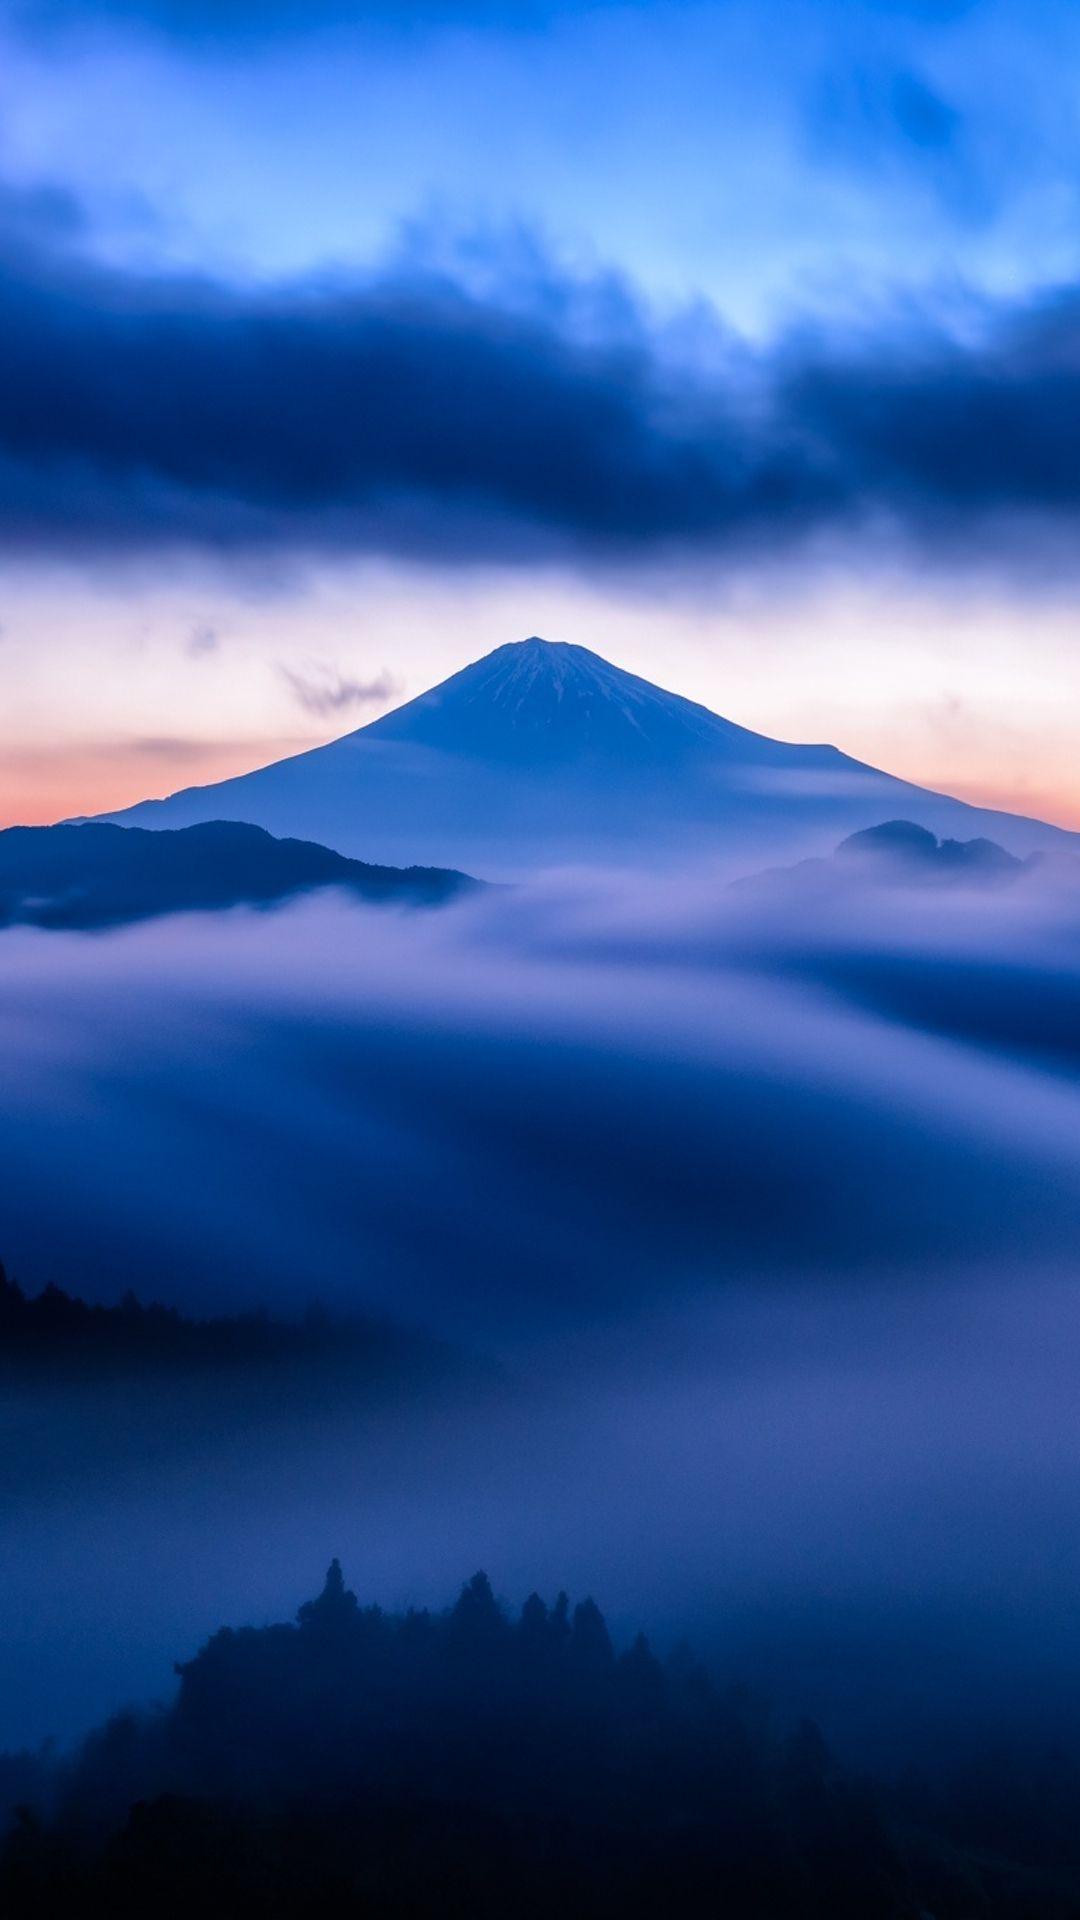 Amazing Wallpaper Mountain Galaxy S5 - 3a8d3ba27a1405d881f1ade2627b9367  Collection_39486.jpg